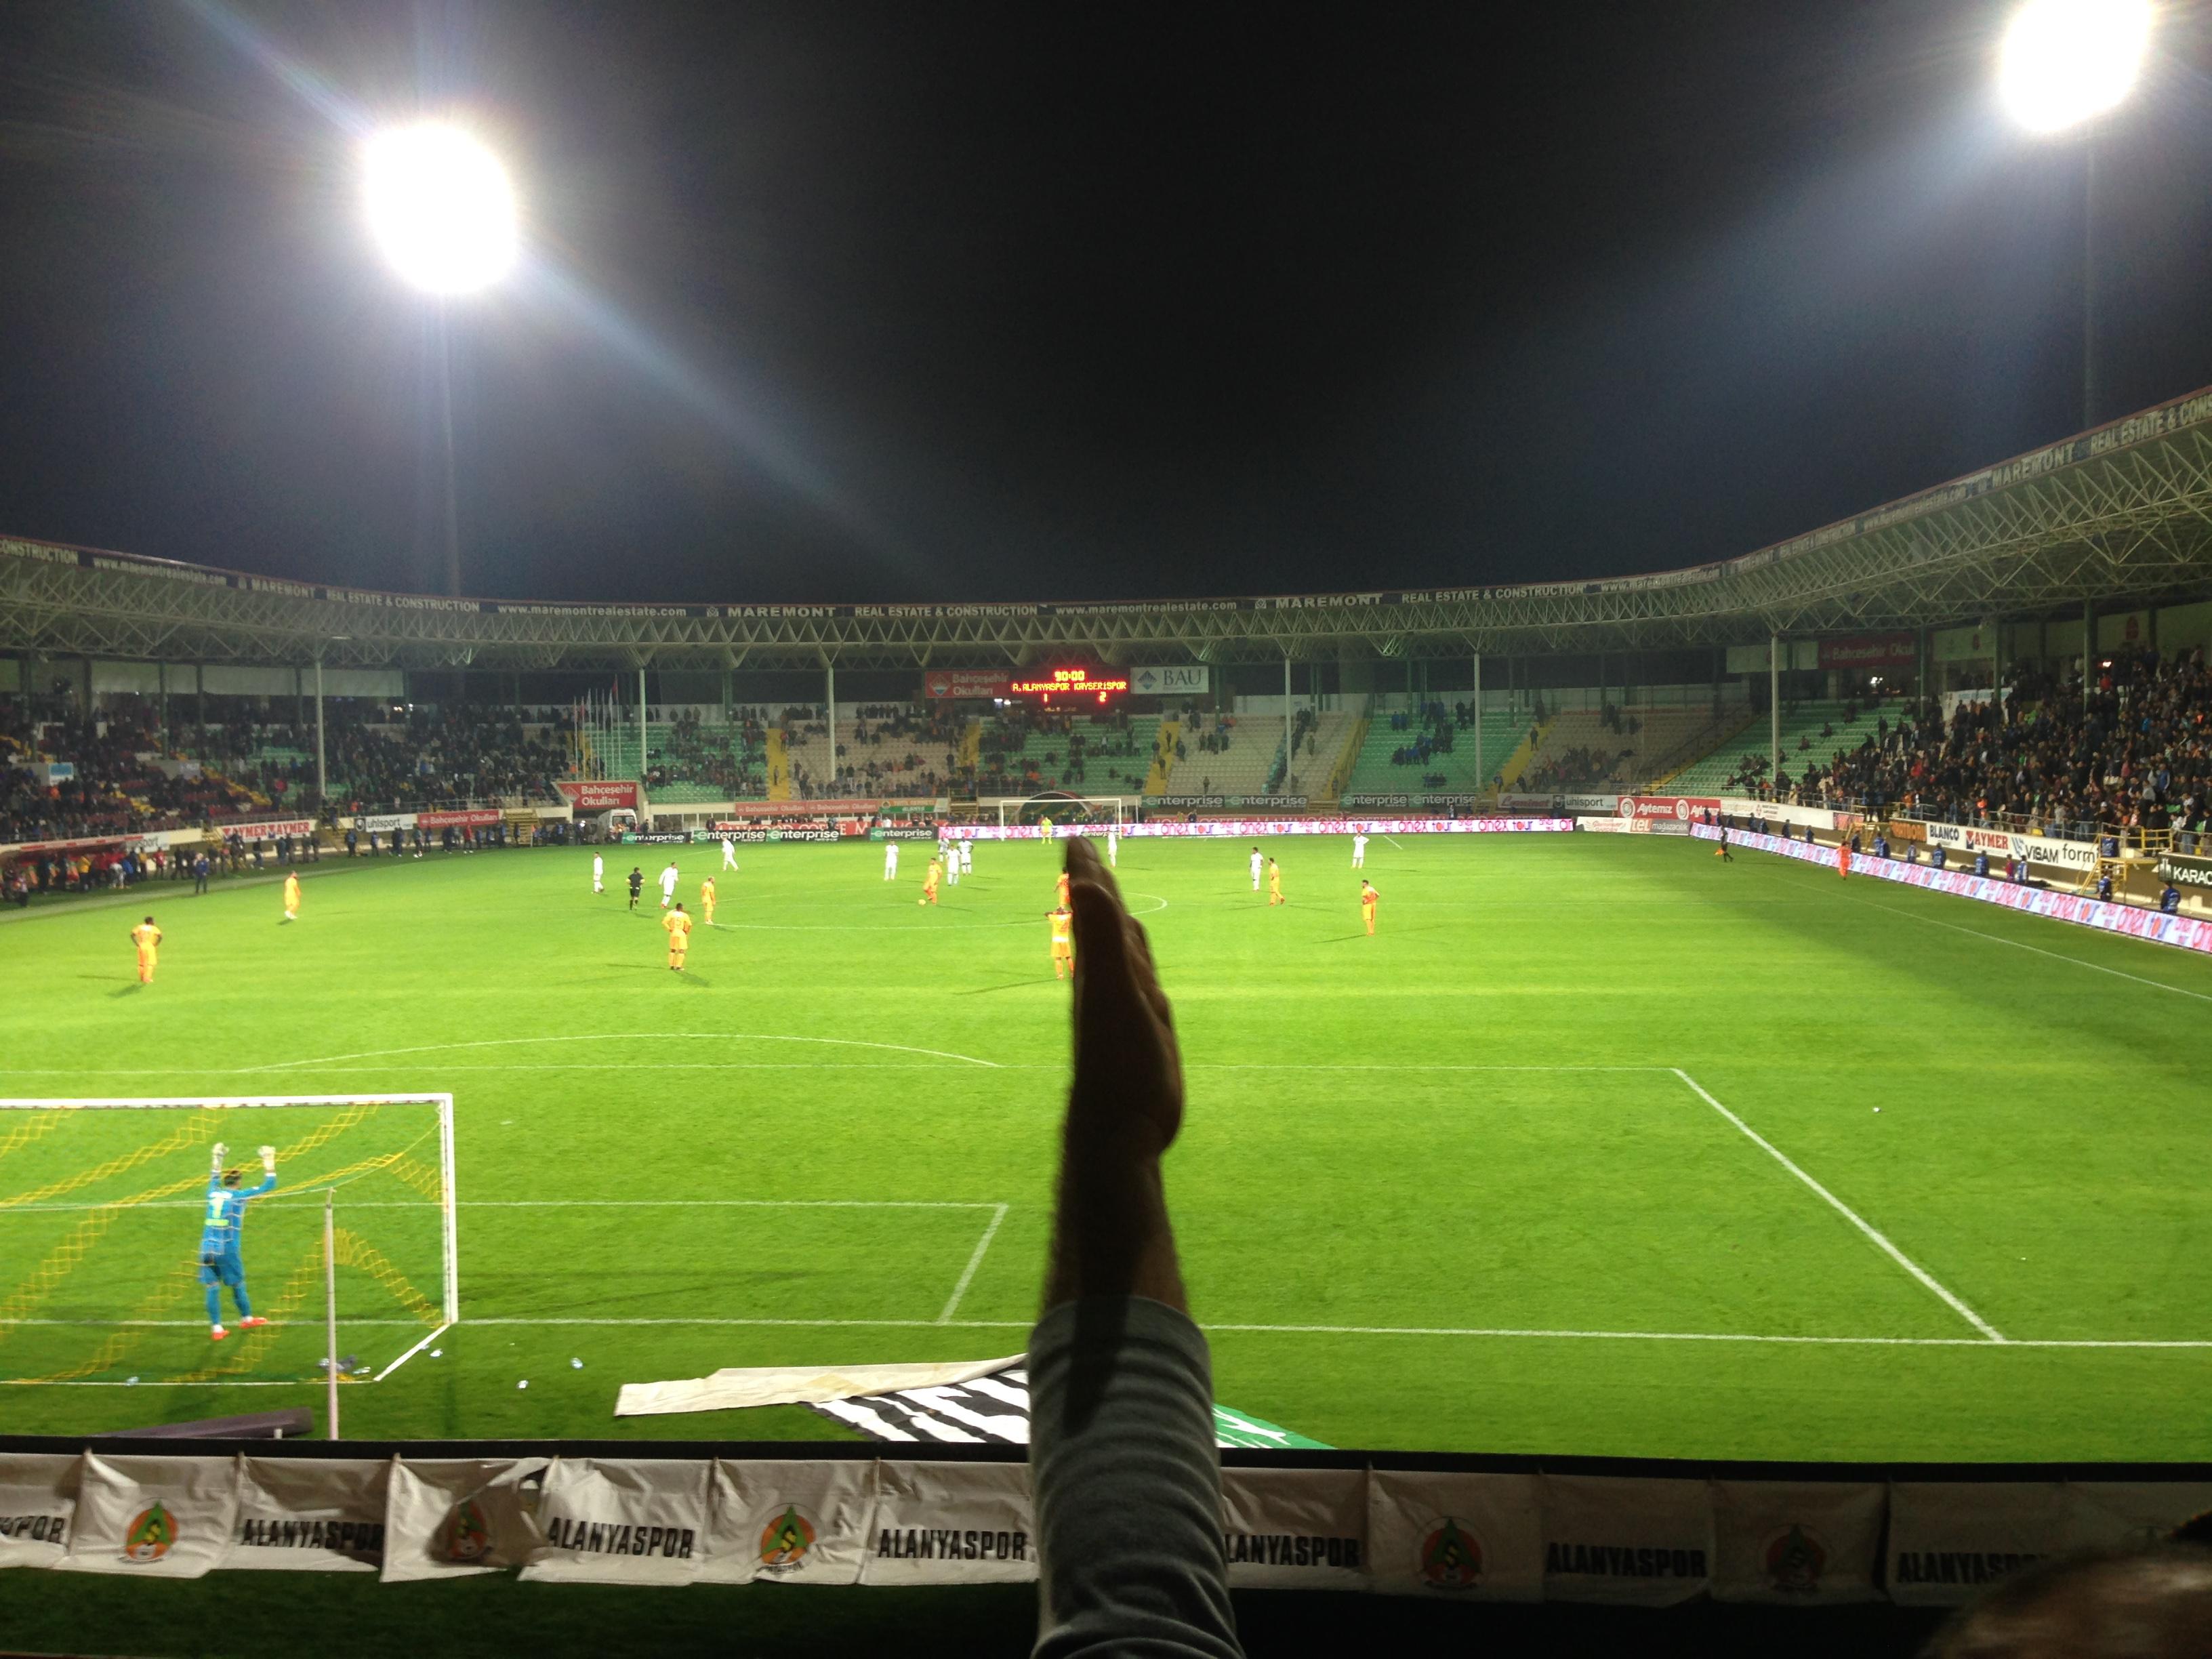 Турецкая Суперлига: Аланьяспор - Кайсериспор